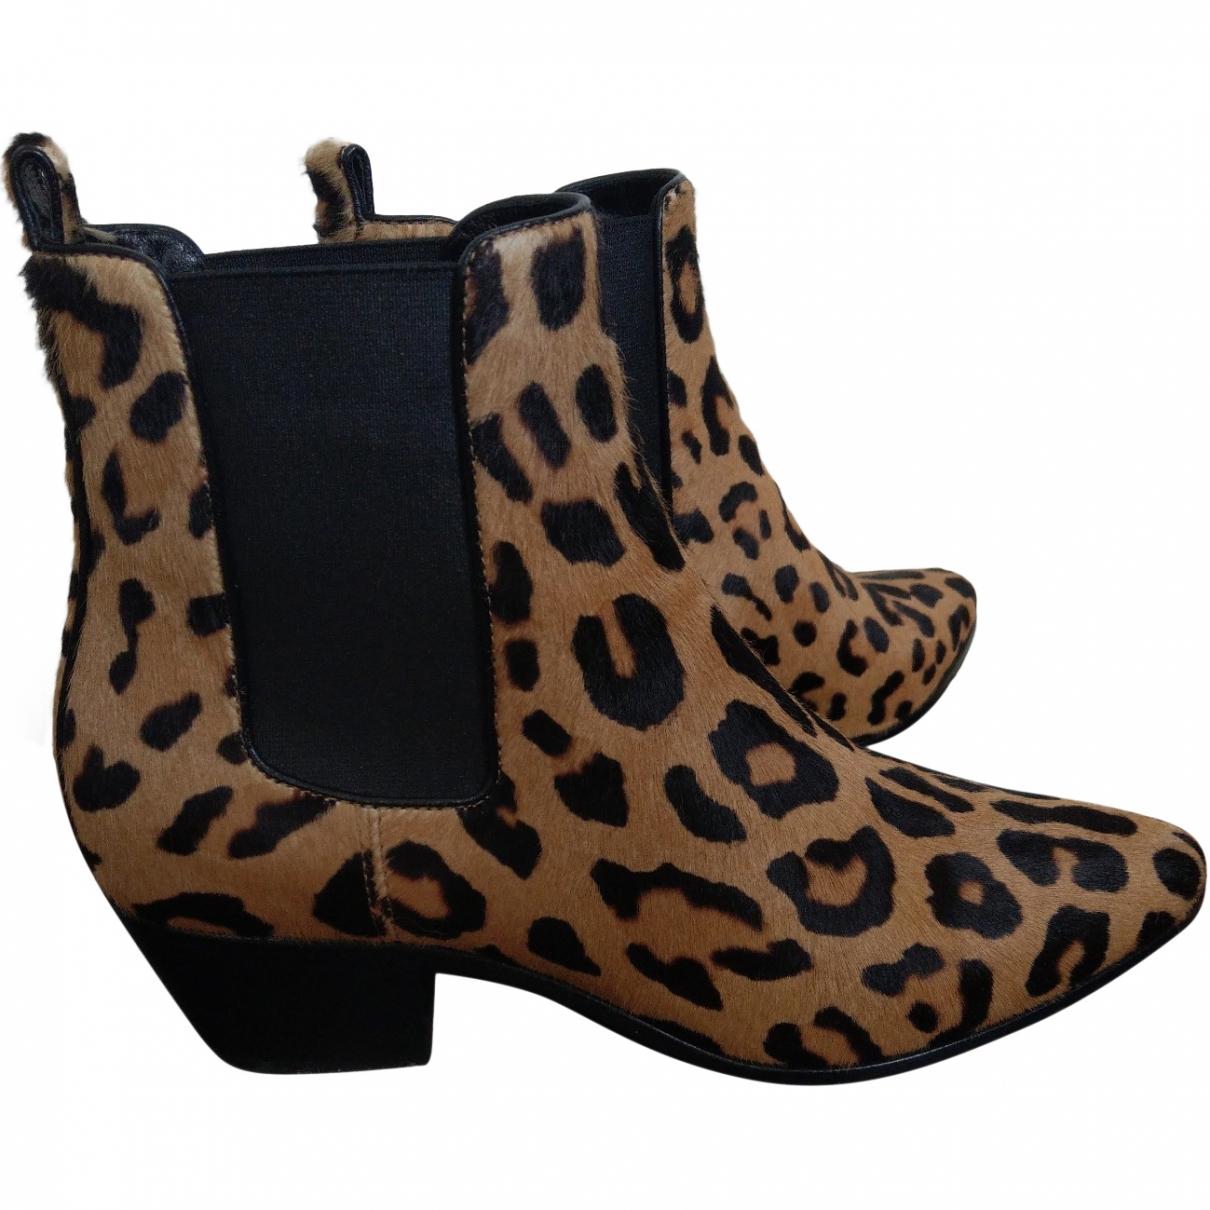 Saint Laurent \N Beige Pony-style calfskin Ankle boots for Women 36 EU